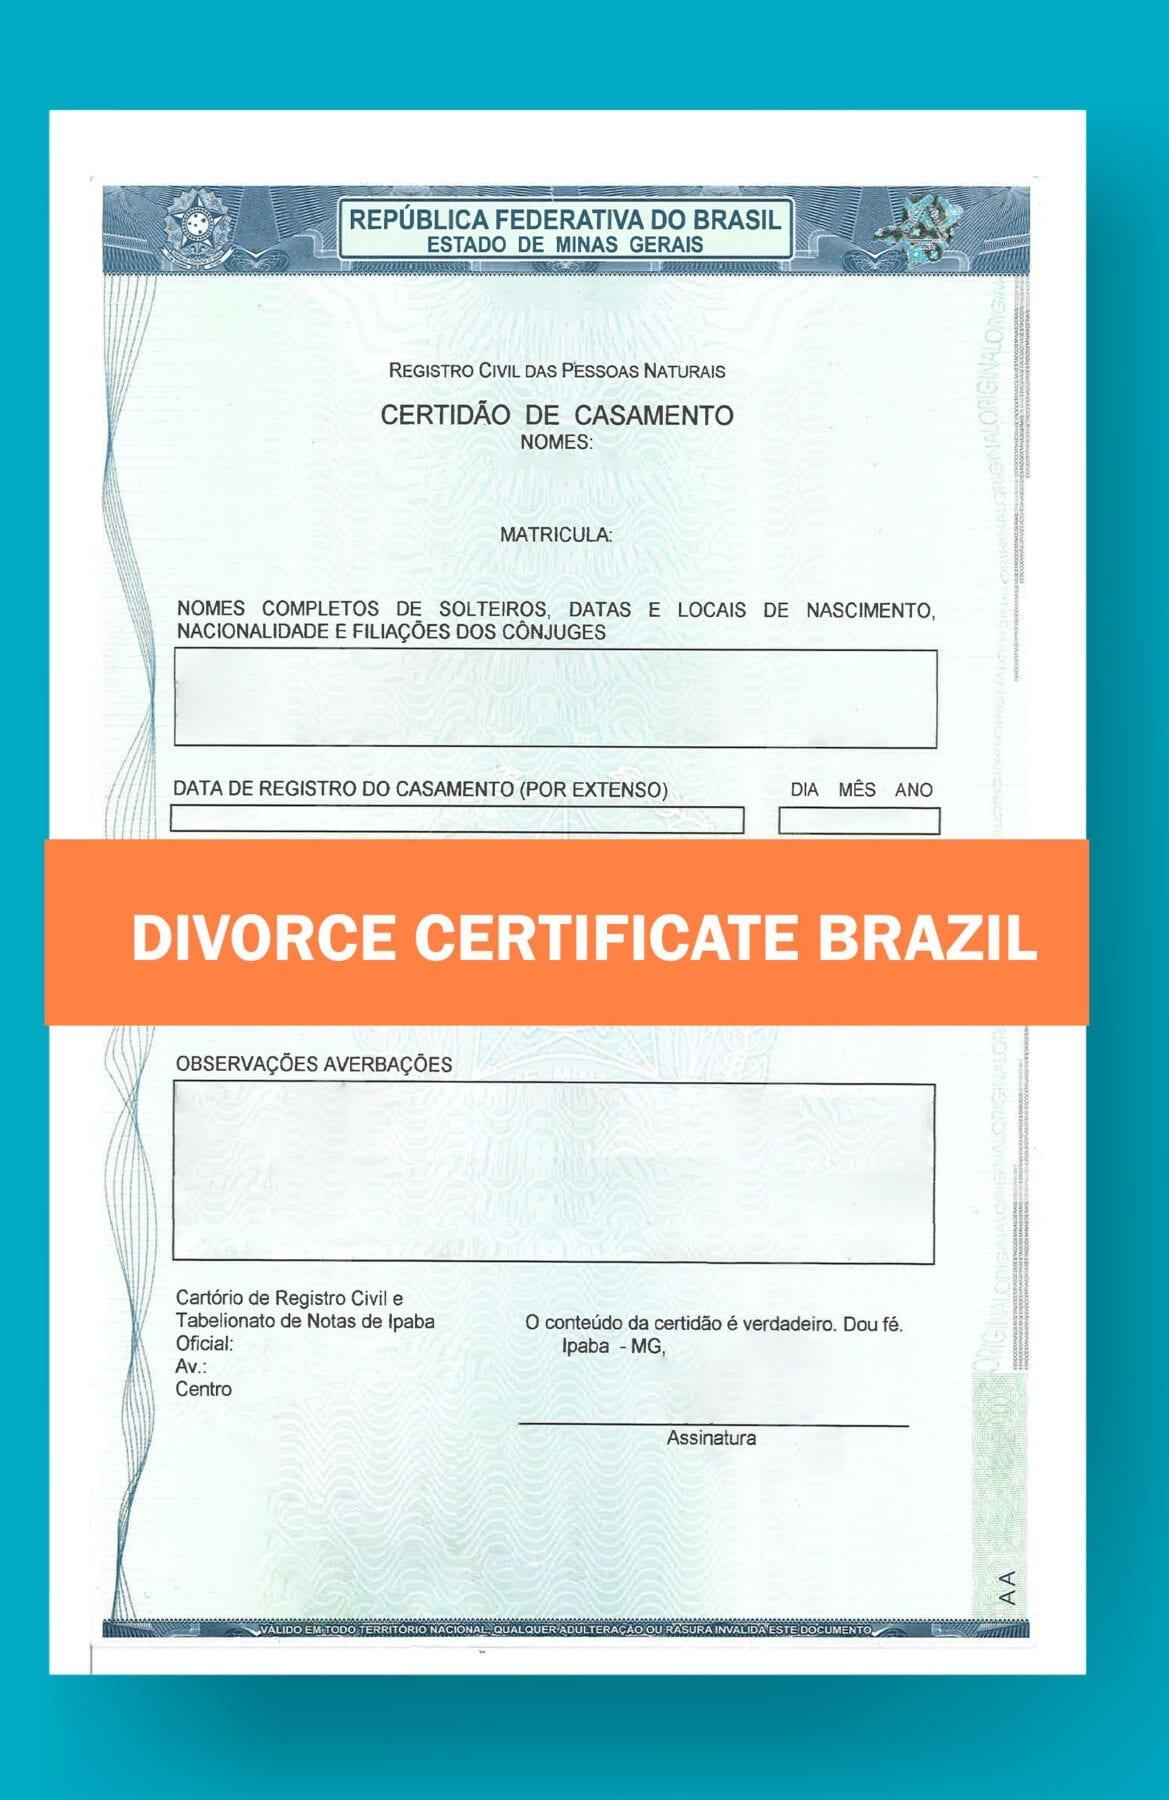 DIVORCE-CERTIFICATE-BRAZIL